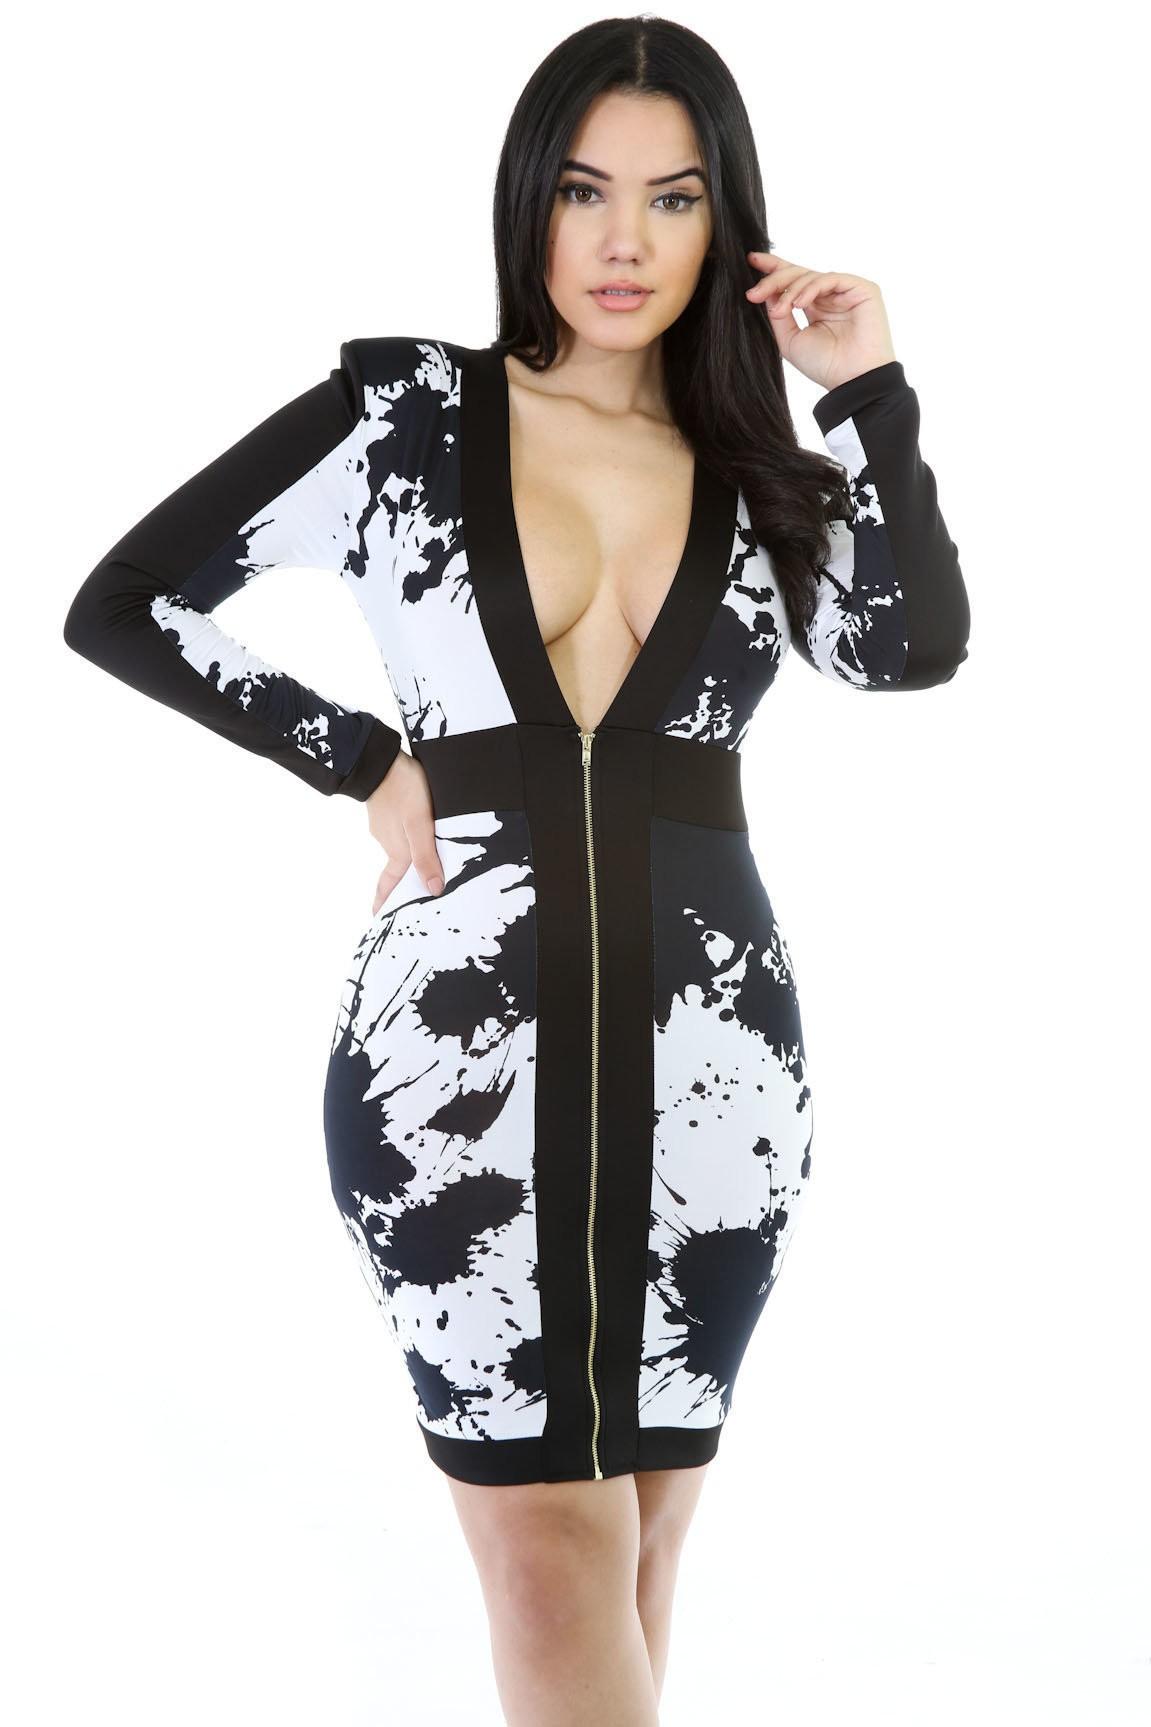 Simply Seductive Dress